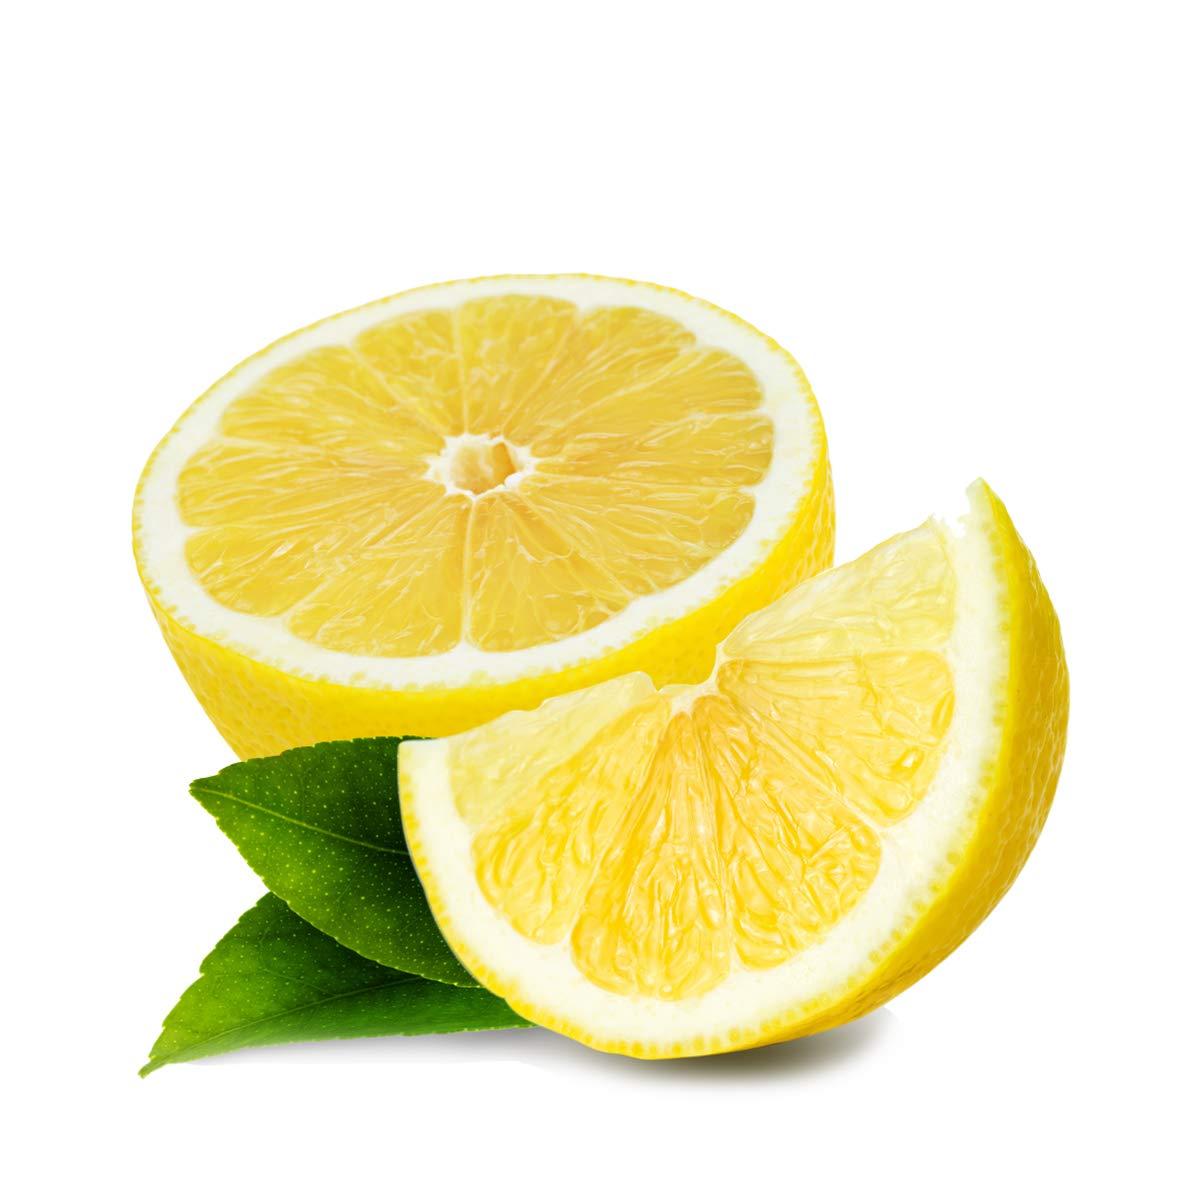 Lakewood Organic Pure Lemon, 32 Ounce (Pack of 6) by Lakewood (Image #6)